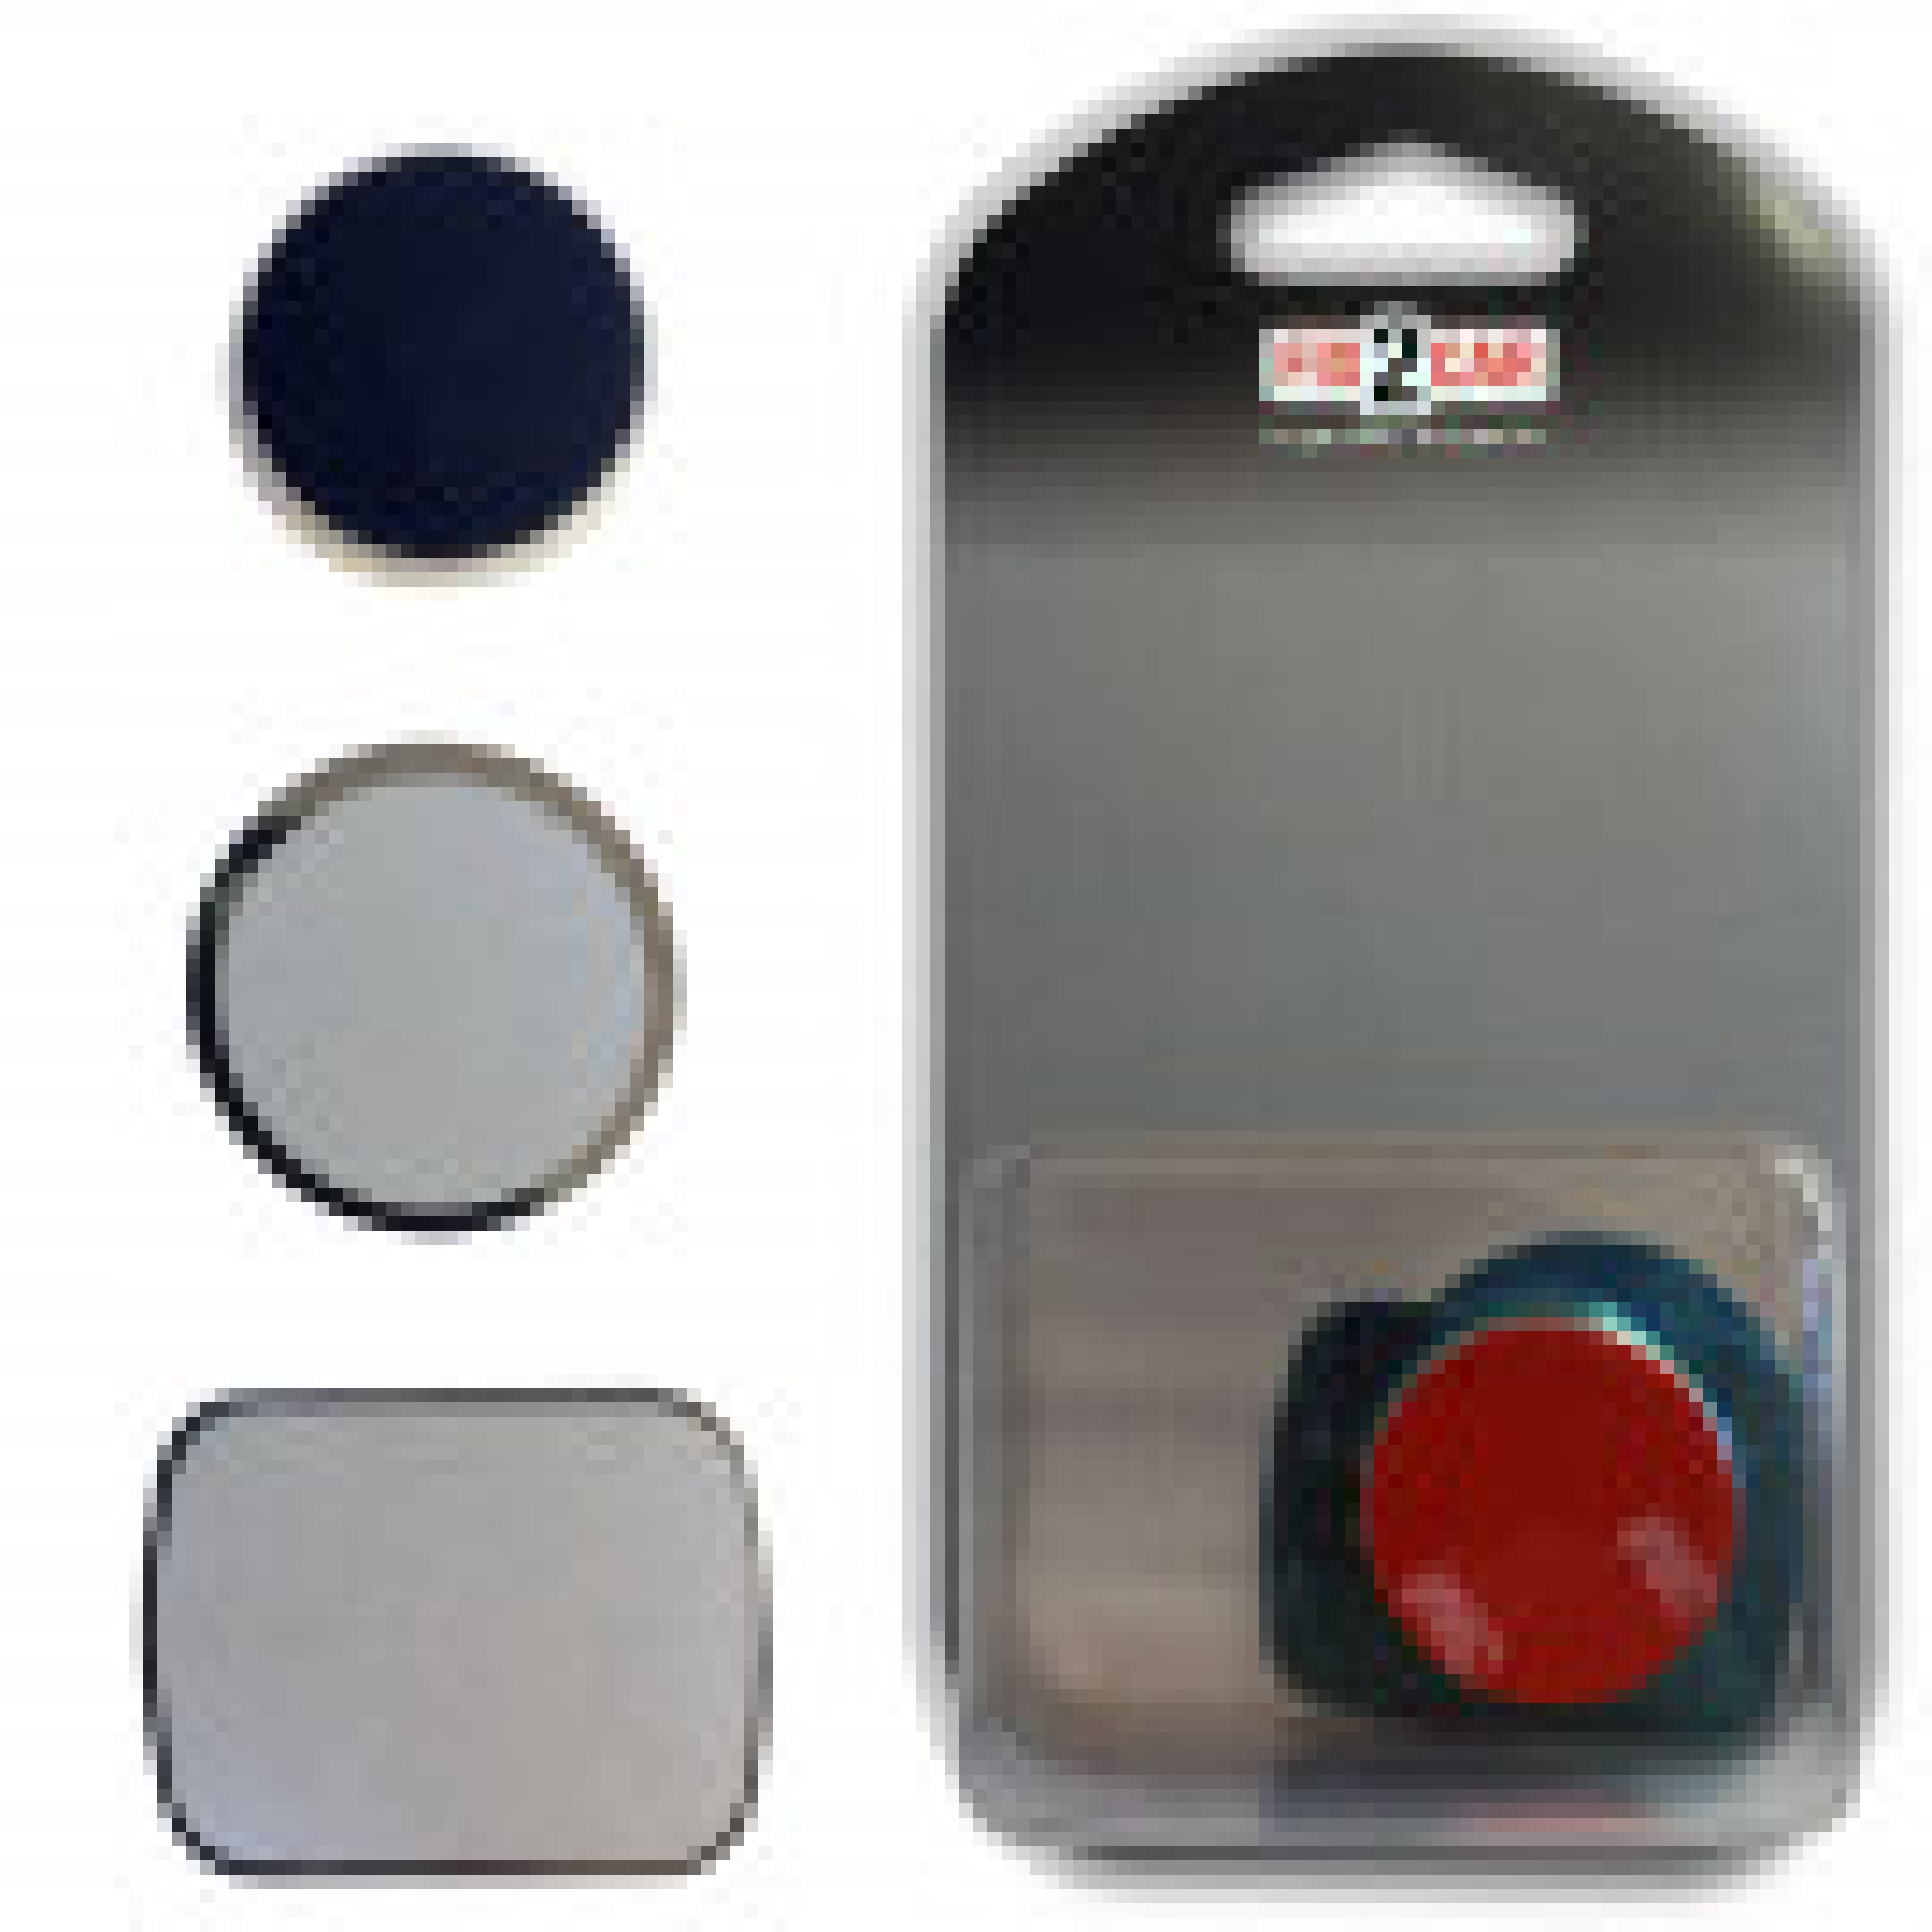 Fix2car Universal Magnet Holder - 64803